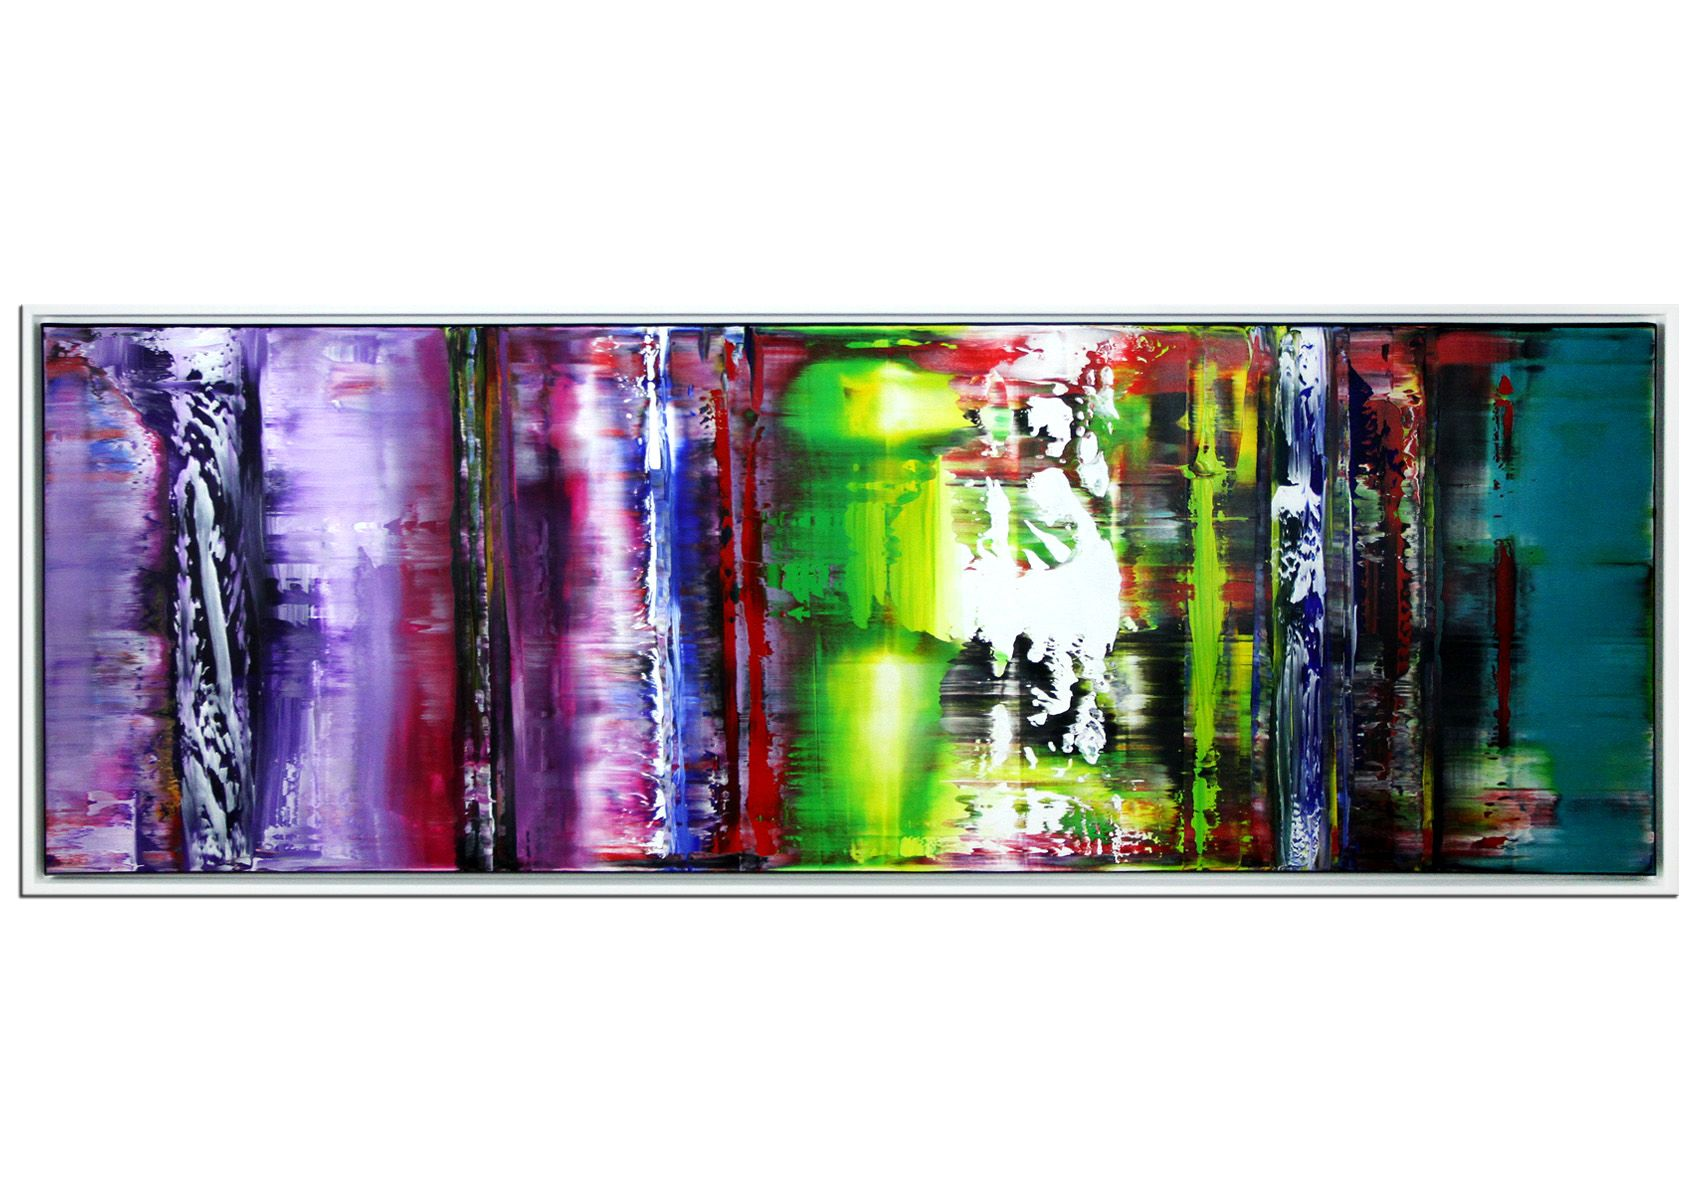 panoramaformat im sf rahmen lebensinhalt original acrylgemalde abstrakt zeitgenossische abstrakte kunst acrylmalerei häuser leinwand acryl